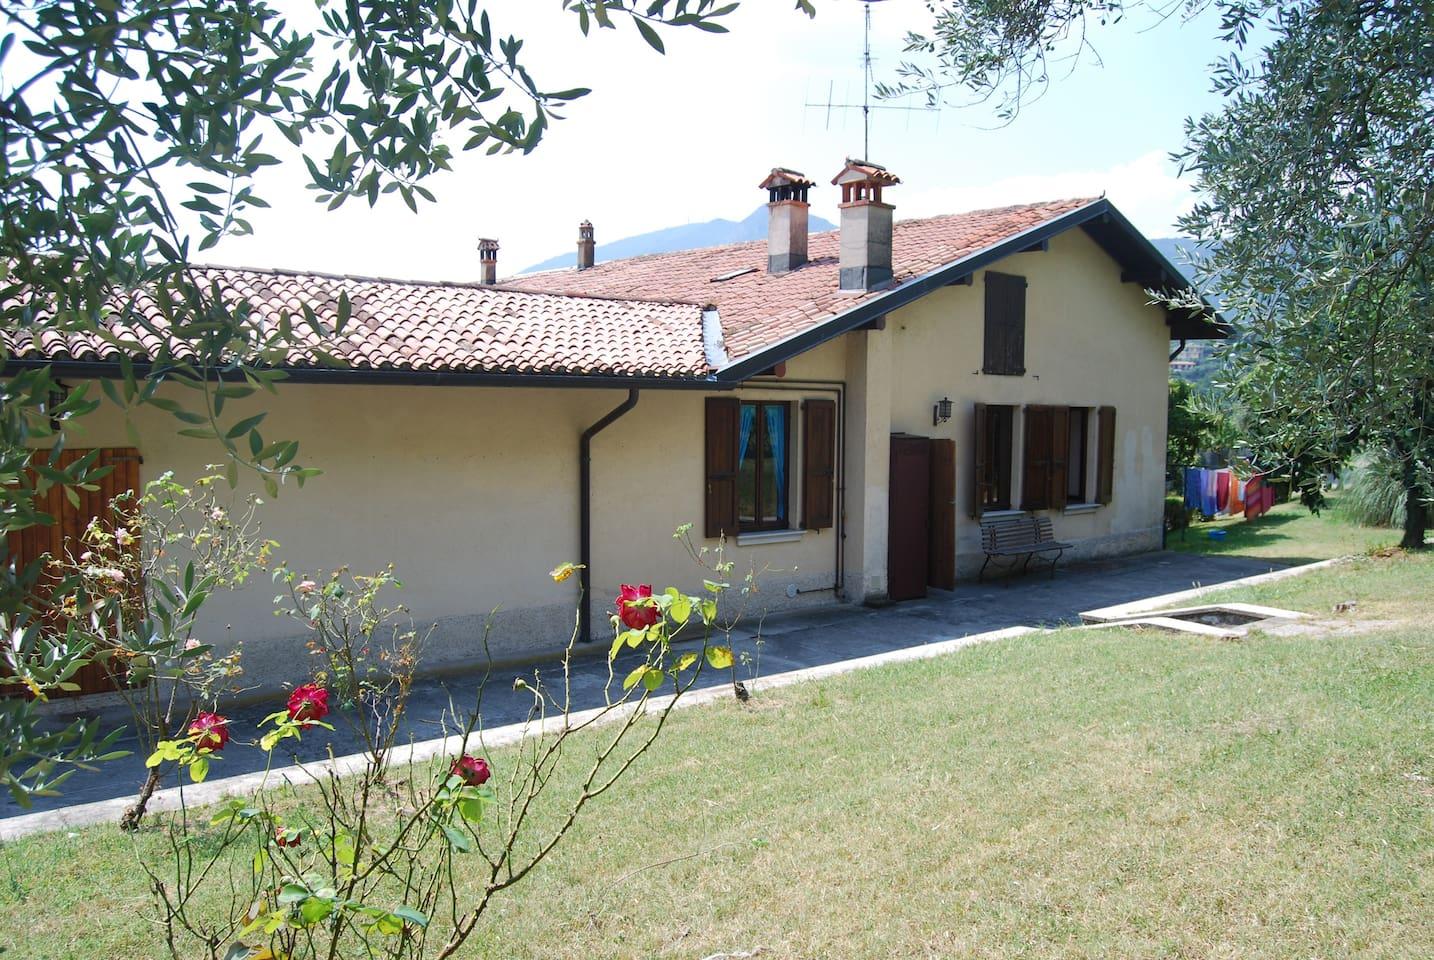 House B - Backyard and Garden